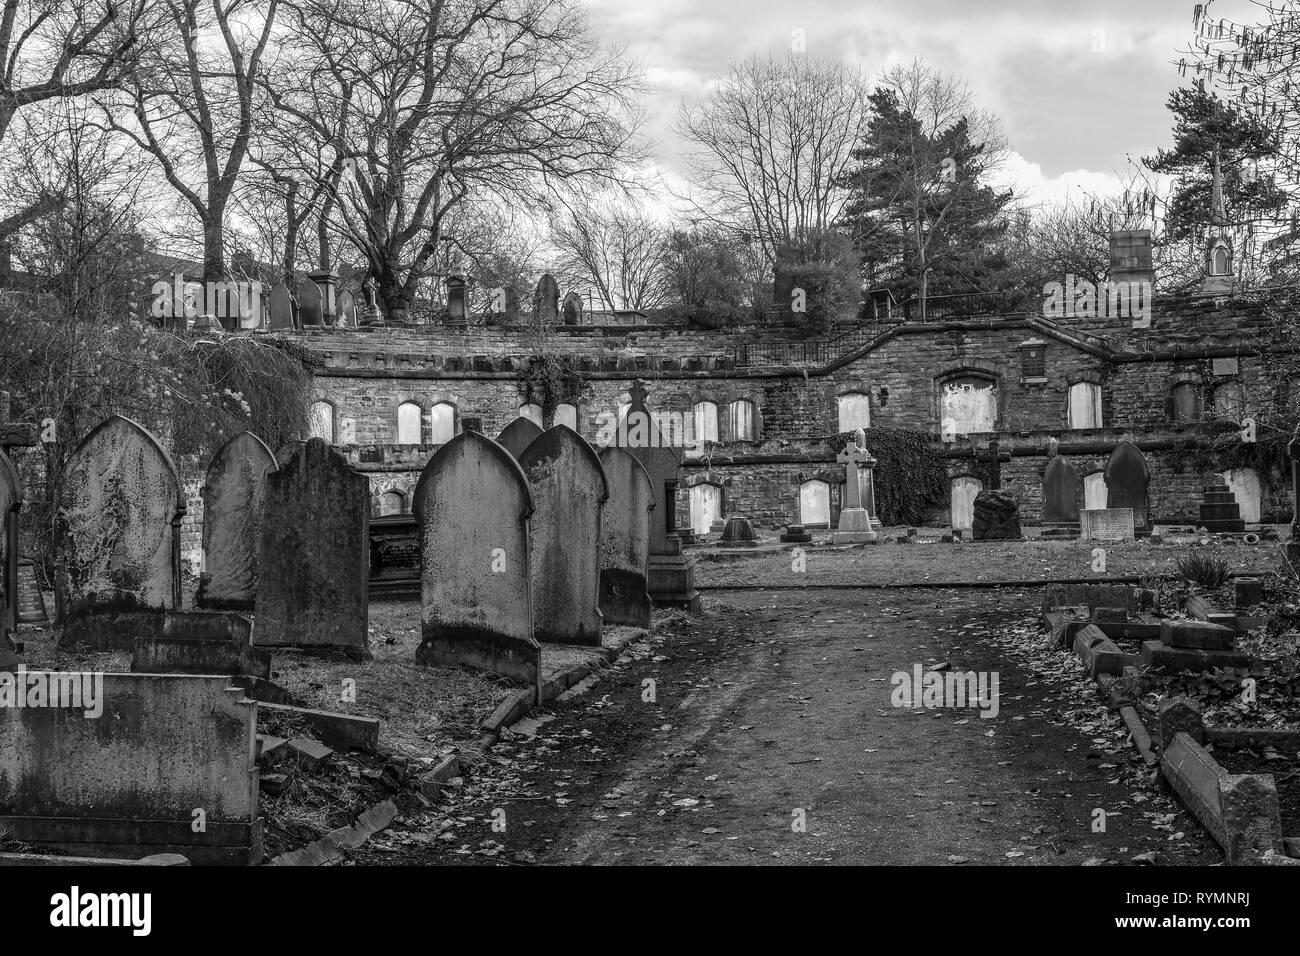 Catacombs at Warstone Lane Cemetery, Jewellery Quarter, Birmingham UK - Stock Image